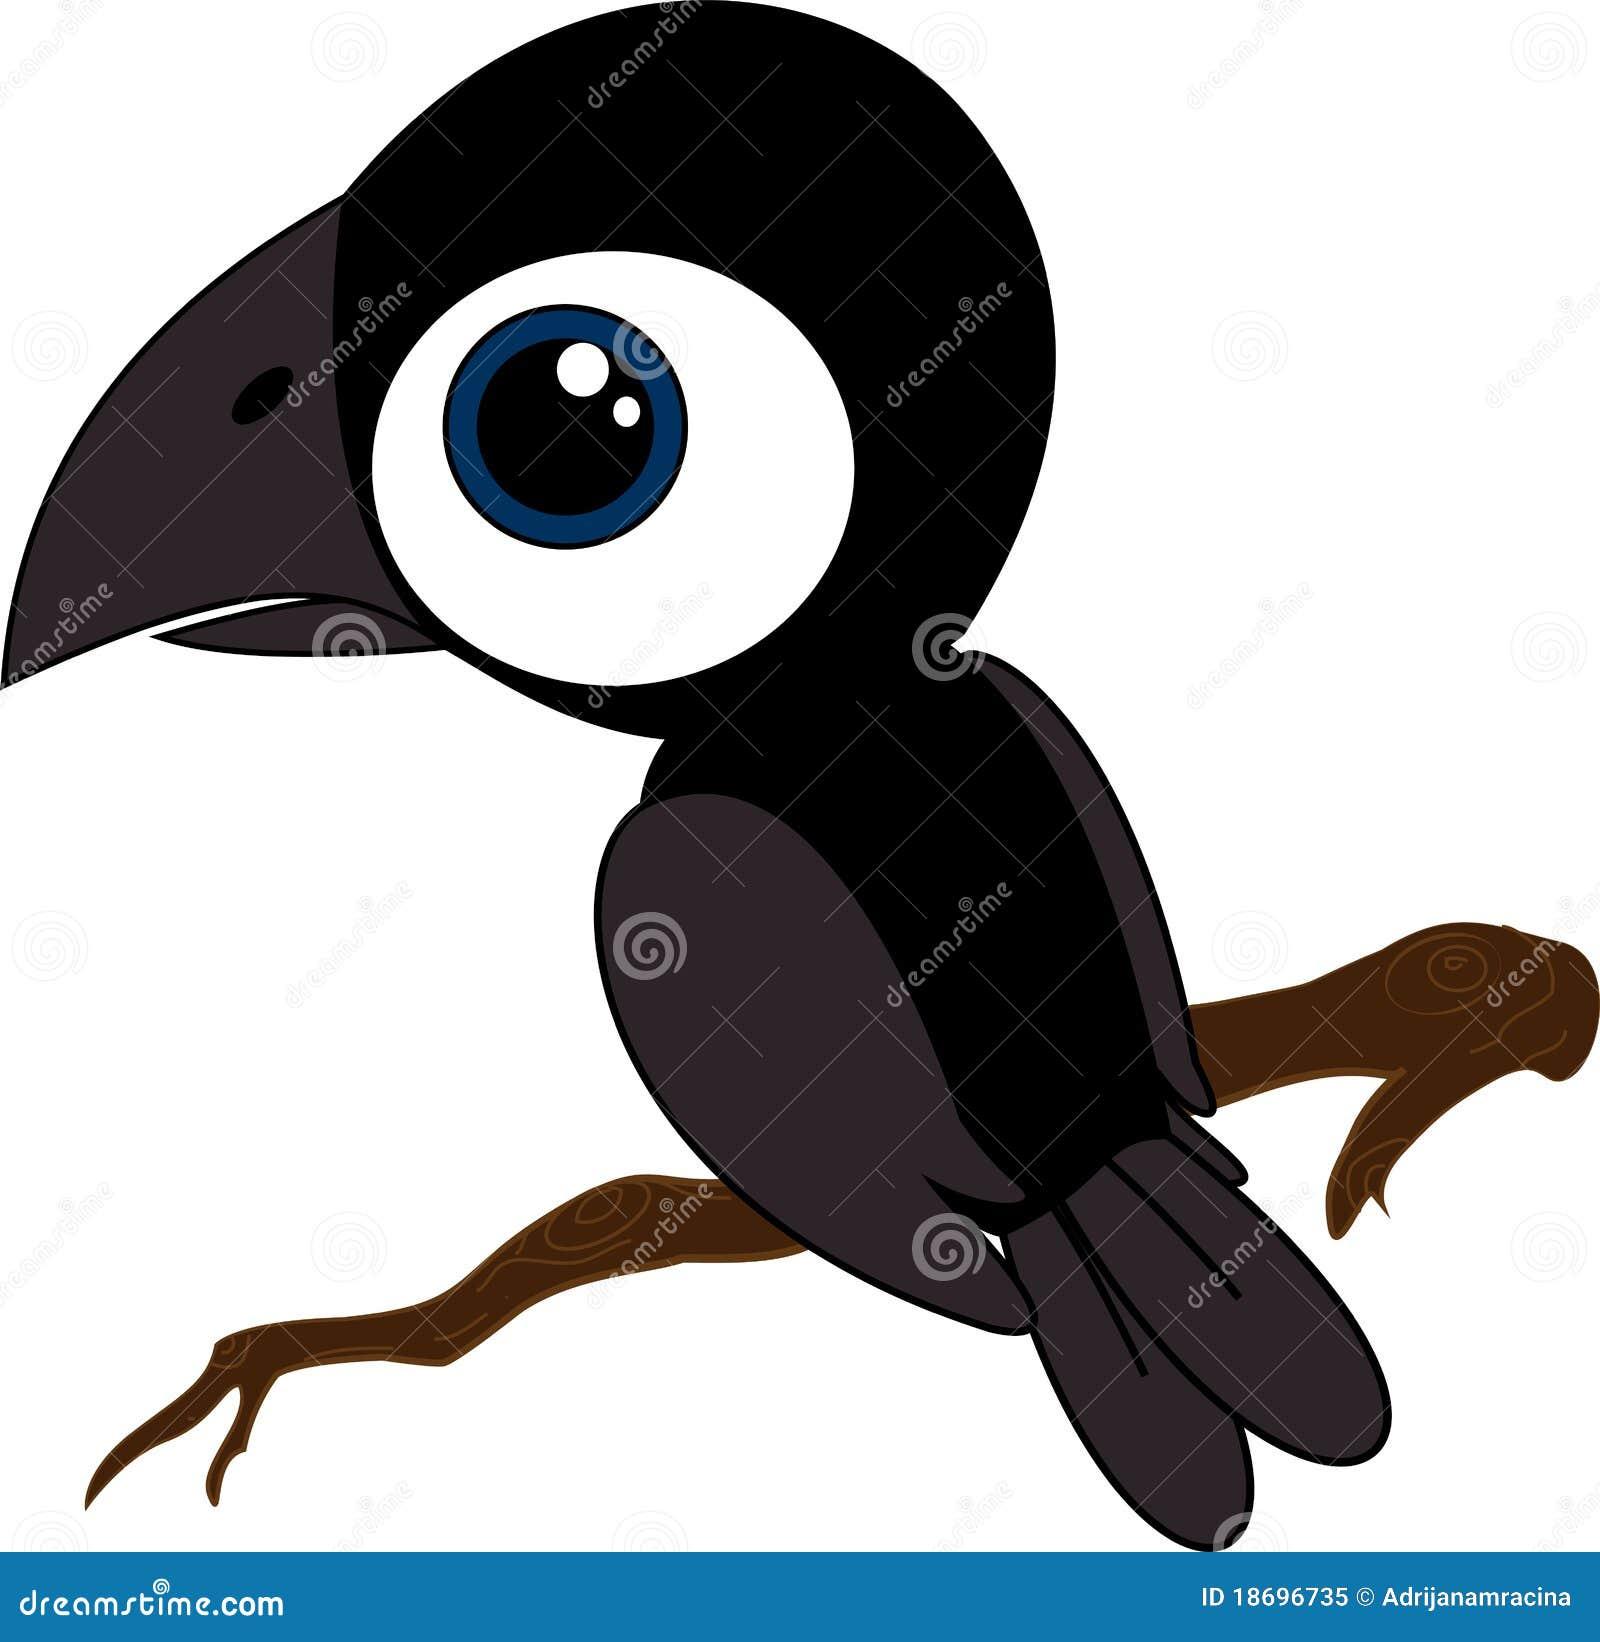 Black Raven - The Solitude Of Ravens